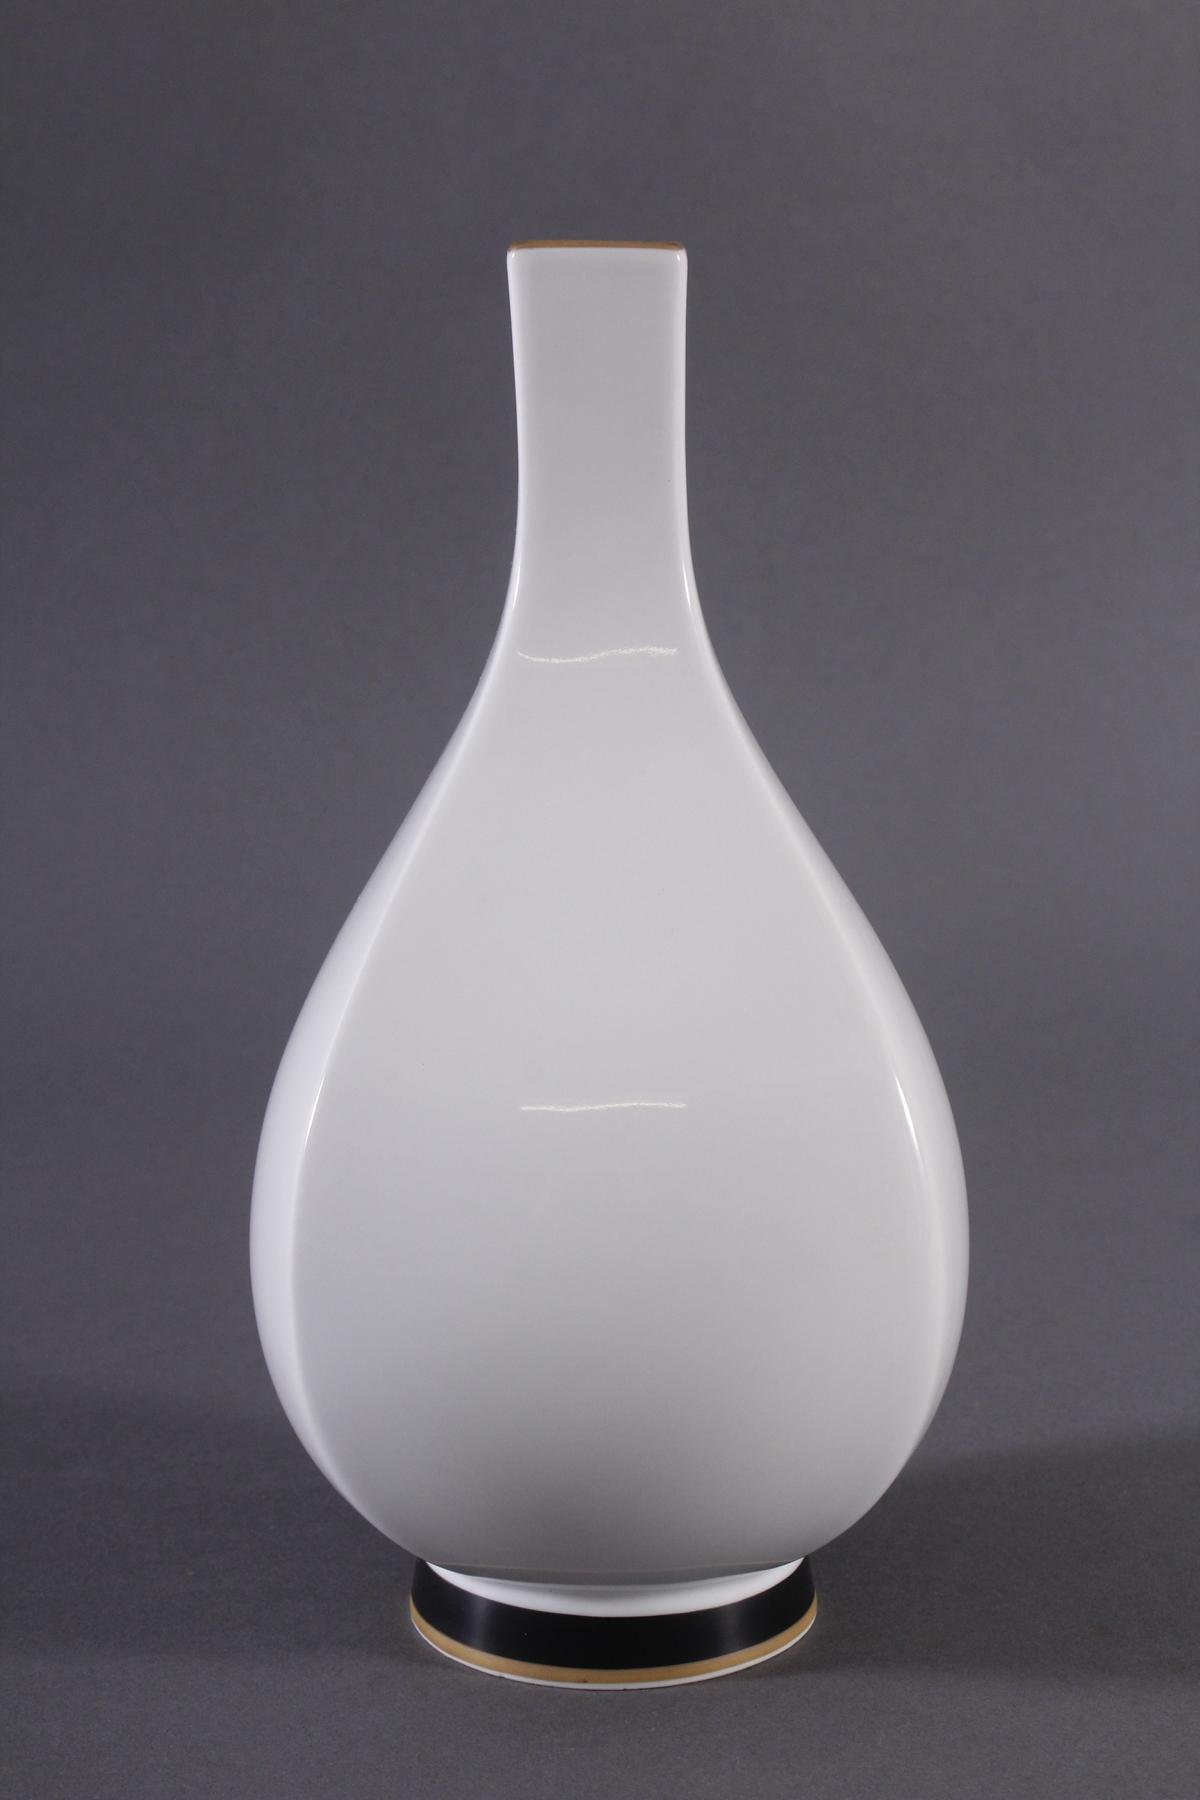 Vase, Entwurf Trude Petri, KPM Berlin